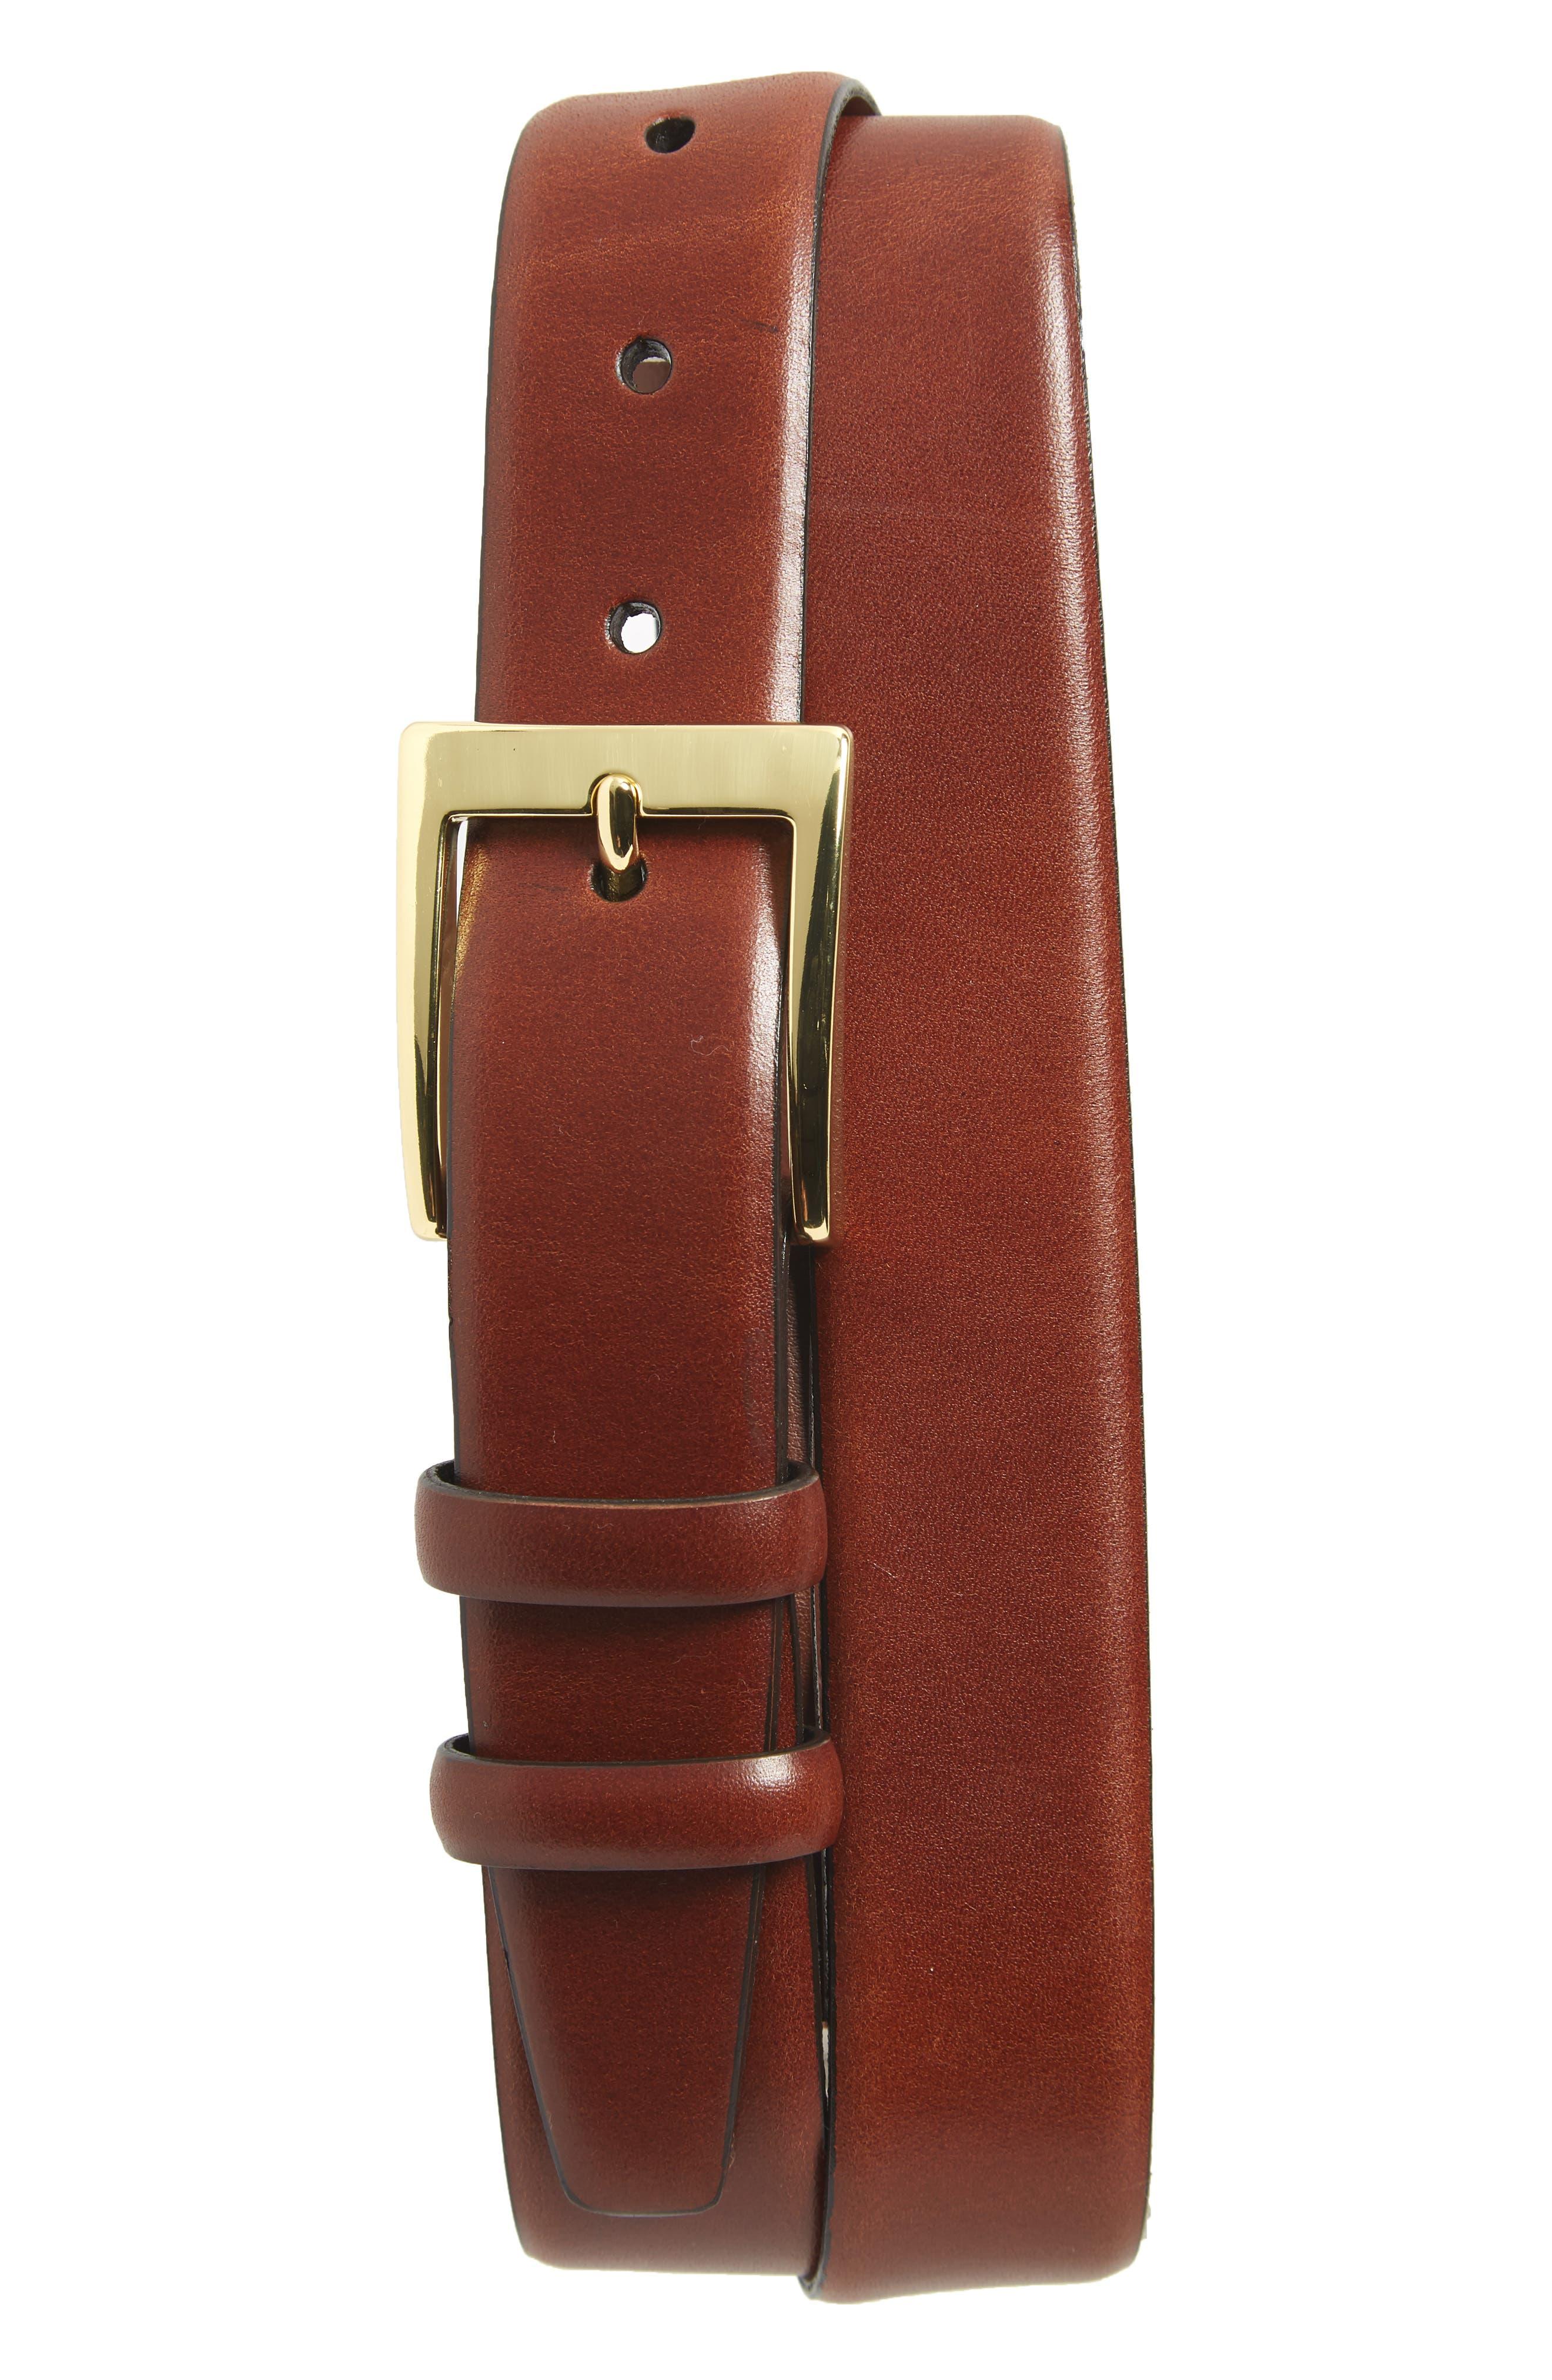 Torino Belts Double Buckle Leather Belt, Chili